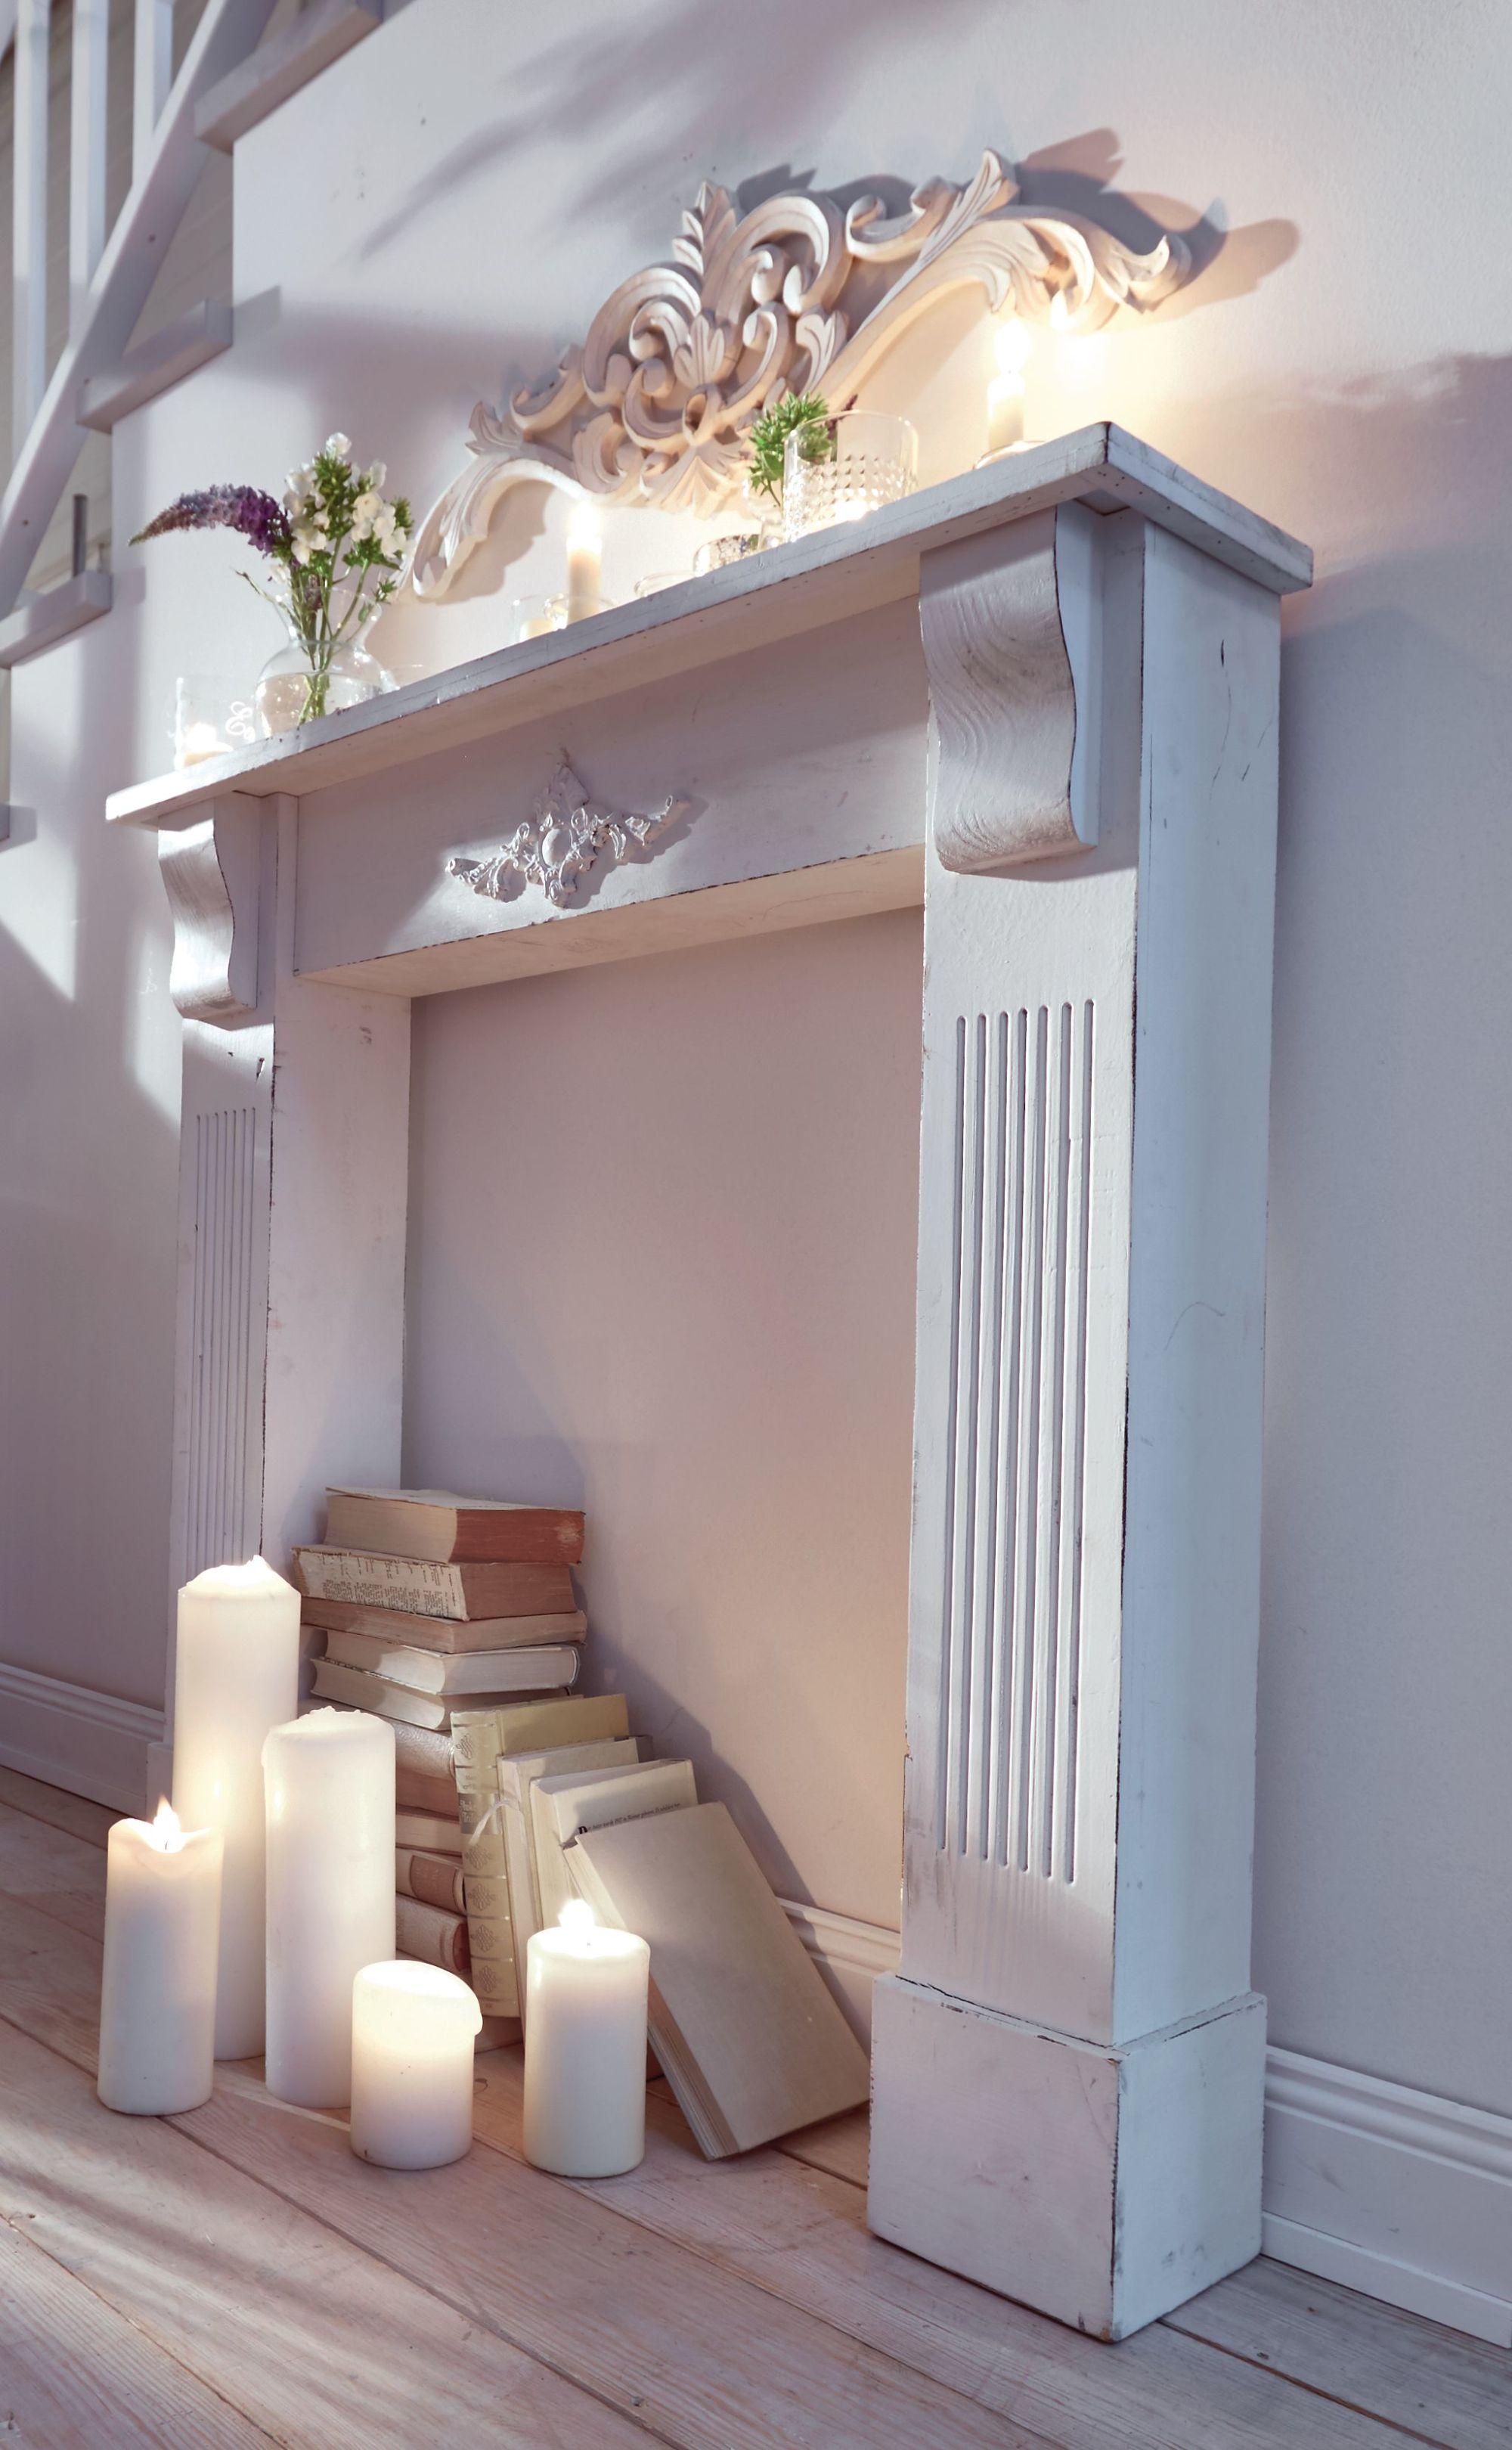 wand deko stuck b80 x t1 5 x h26 cm handgefertigt kaminumrandung wandbeh nge ebay. Black Bedroom Furniture Sets. Home Design Ideas